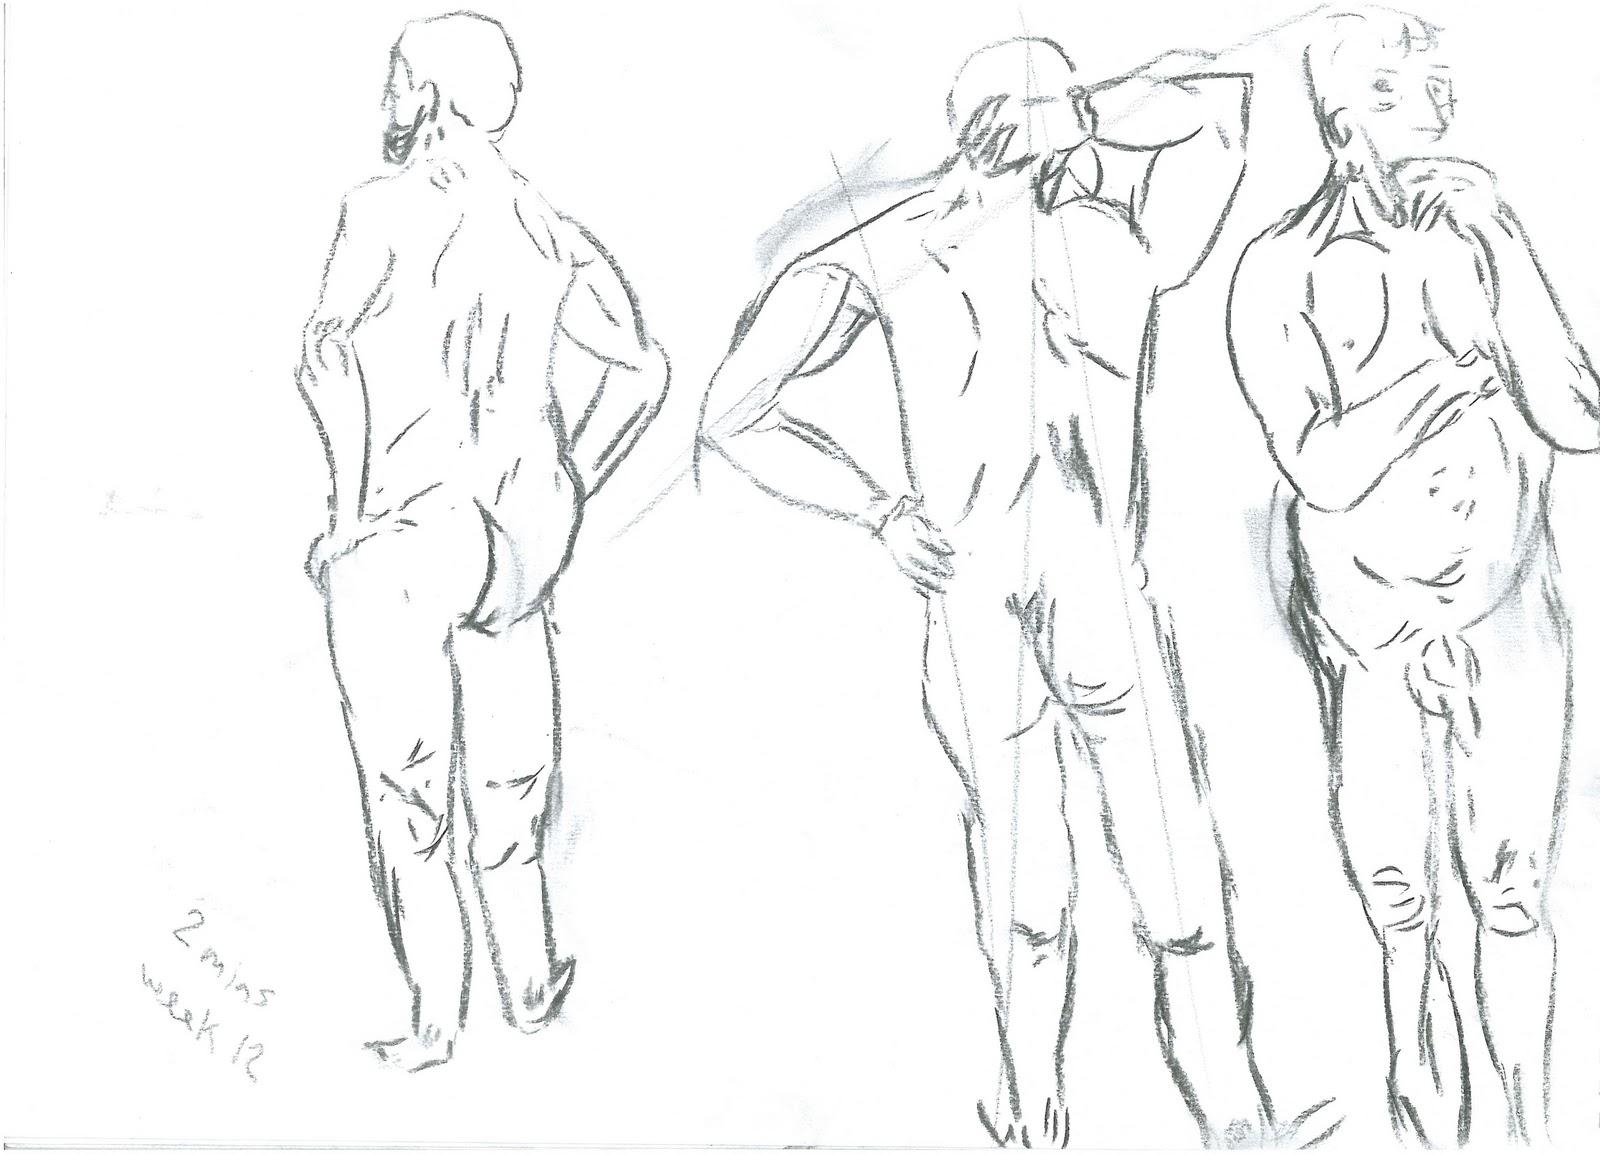 SarokZana O D: Week: 12 Life Draawing and Basic Human Anatomy